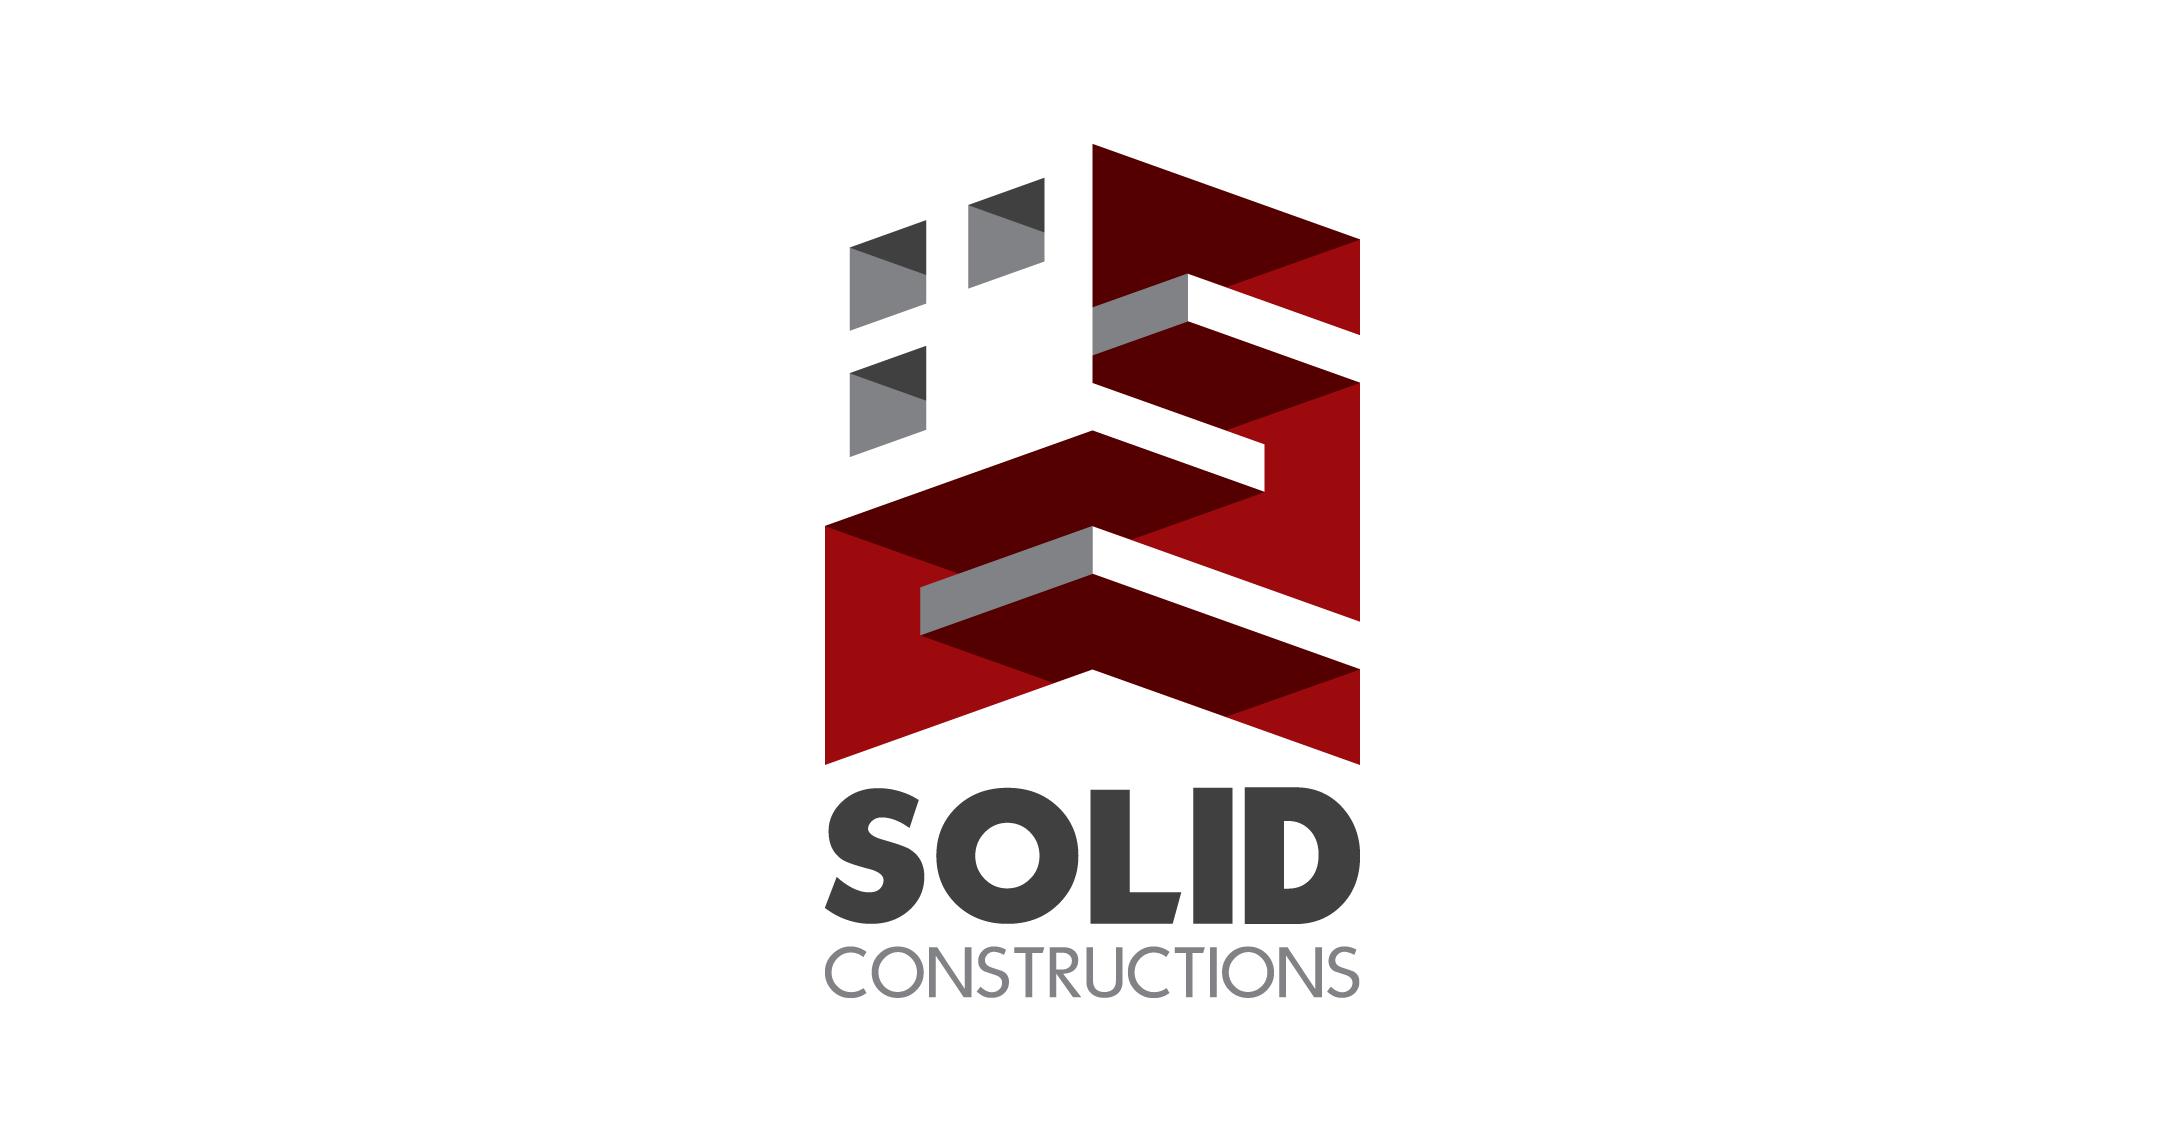 صورة Job: Finance Site Administrator at Solid Constructions in Cairo, Egypt